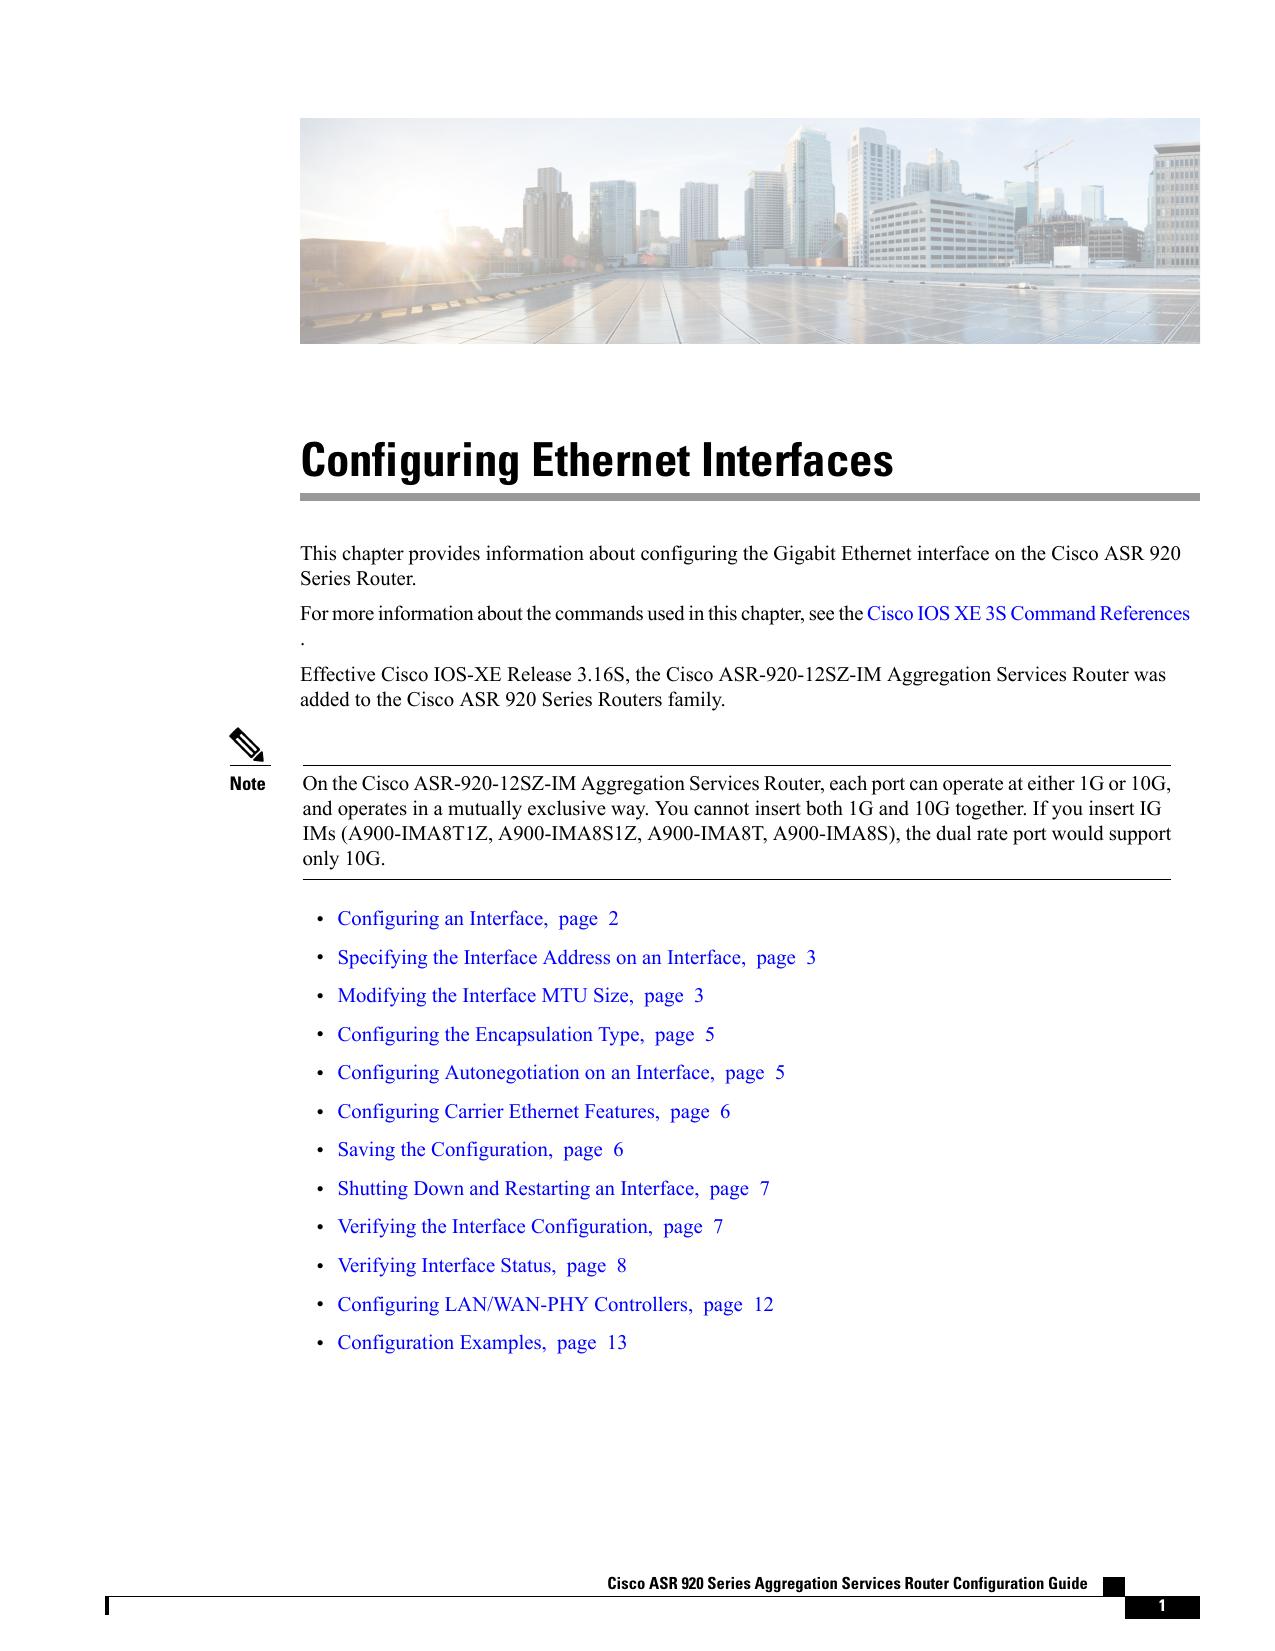 Configuring Ethernet Interfaces | manualzz com